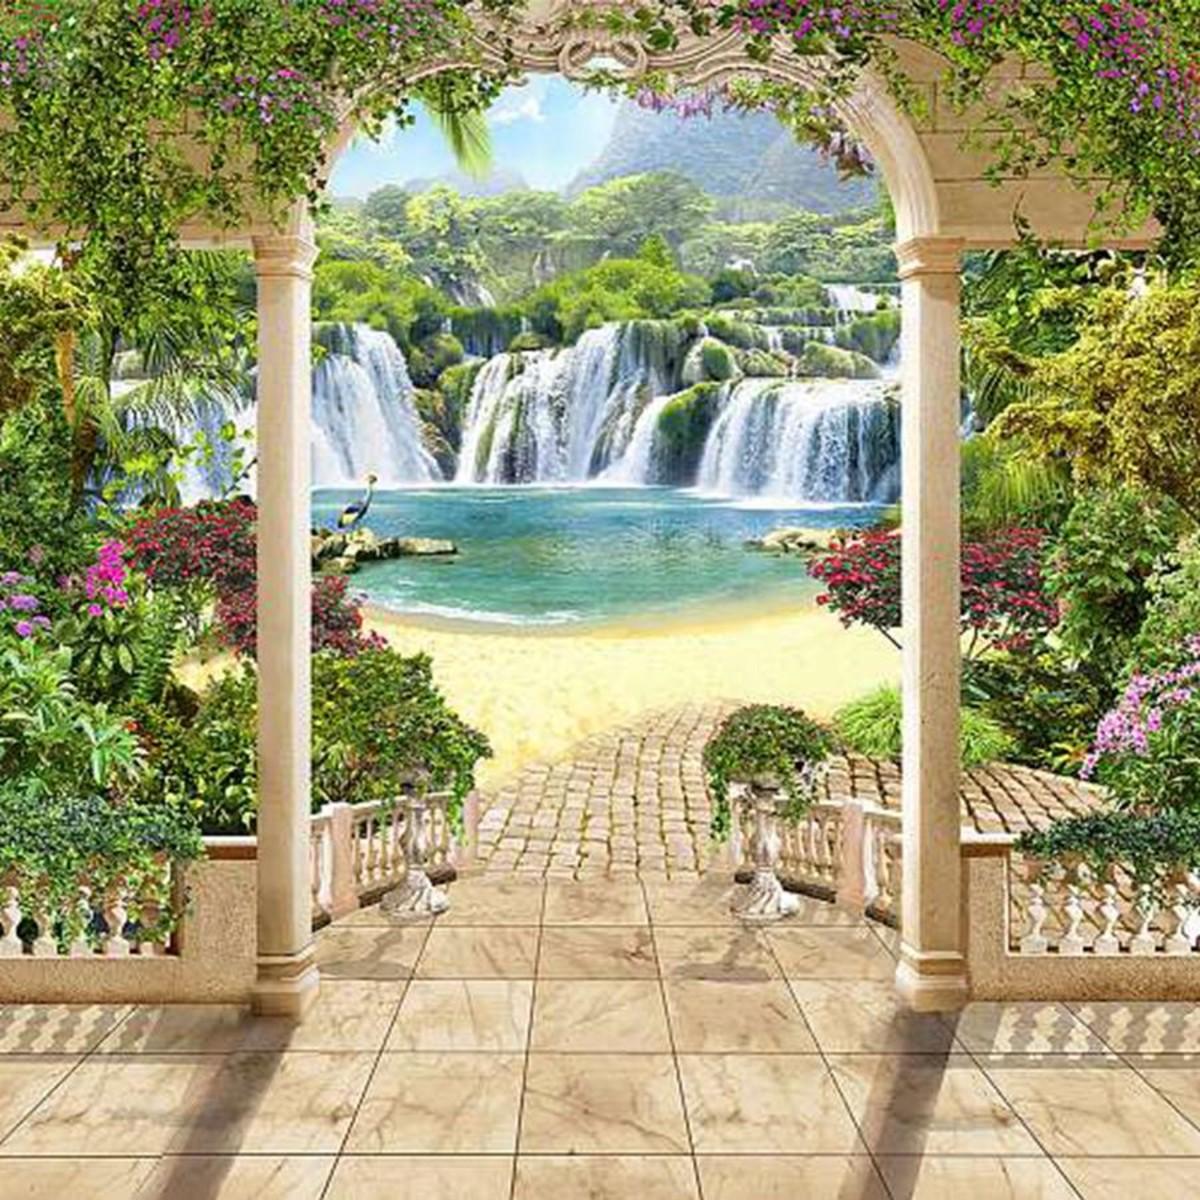 Фотообои Divino Decor Райские водопады K-023 300х270 см